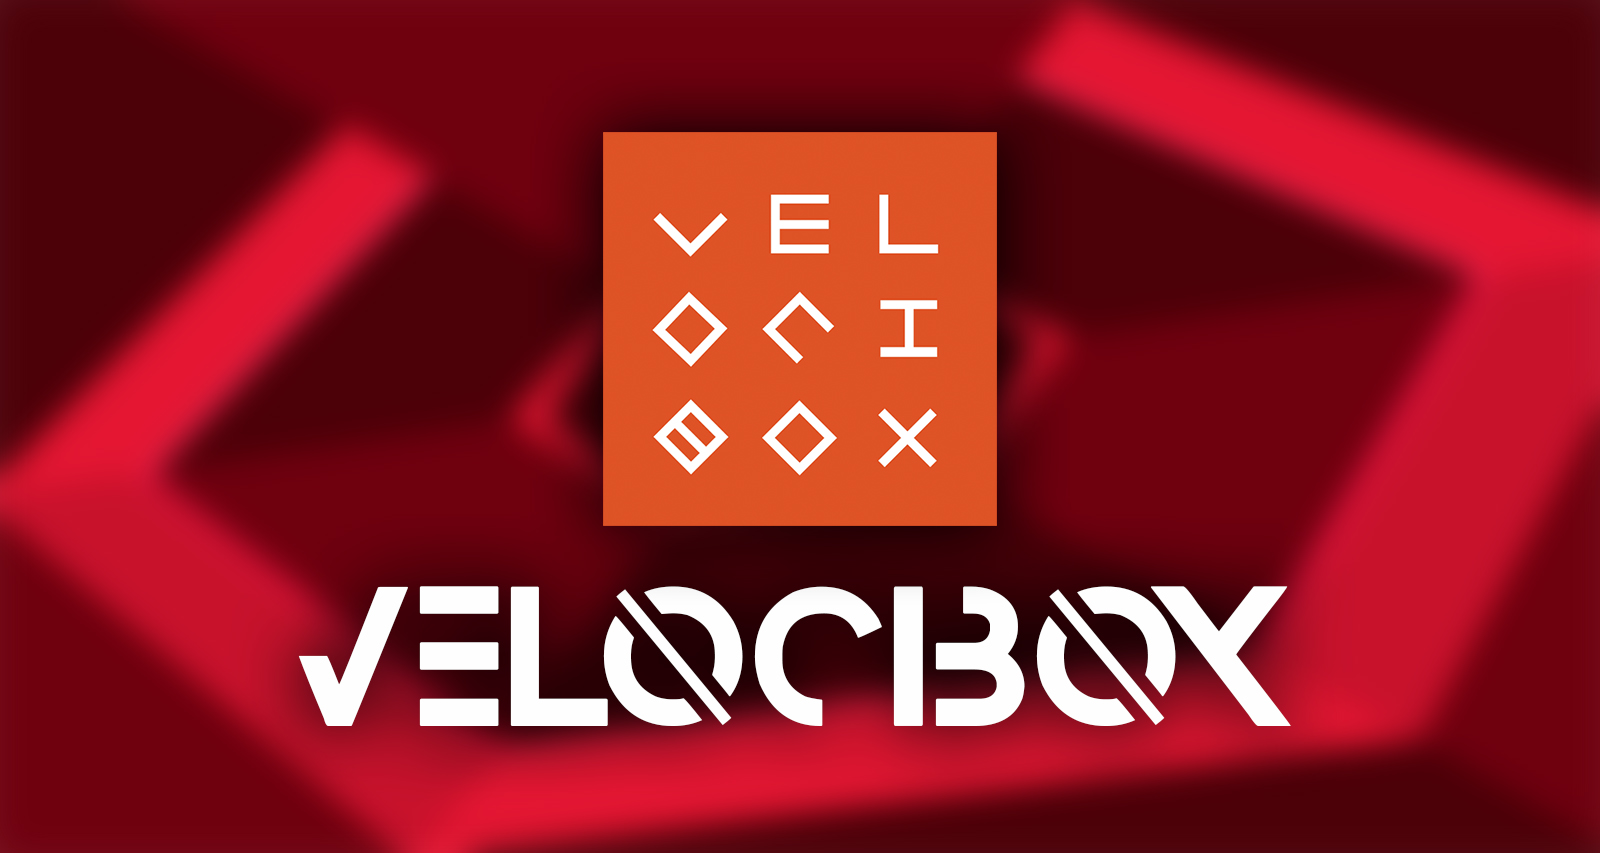 Velocibox Gratis Edition PC Full Español 2017